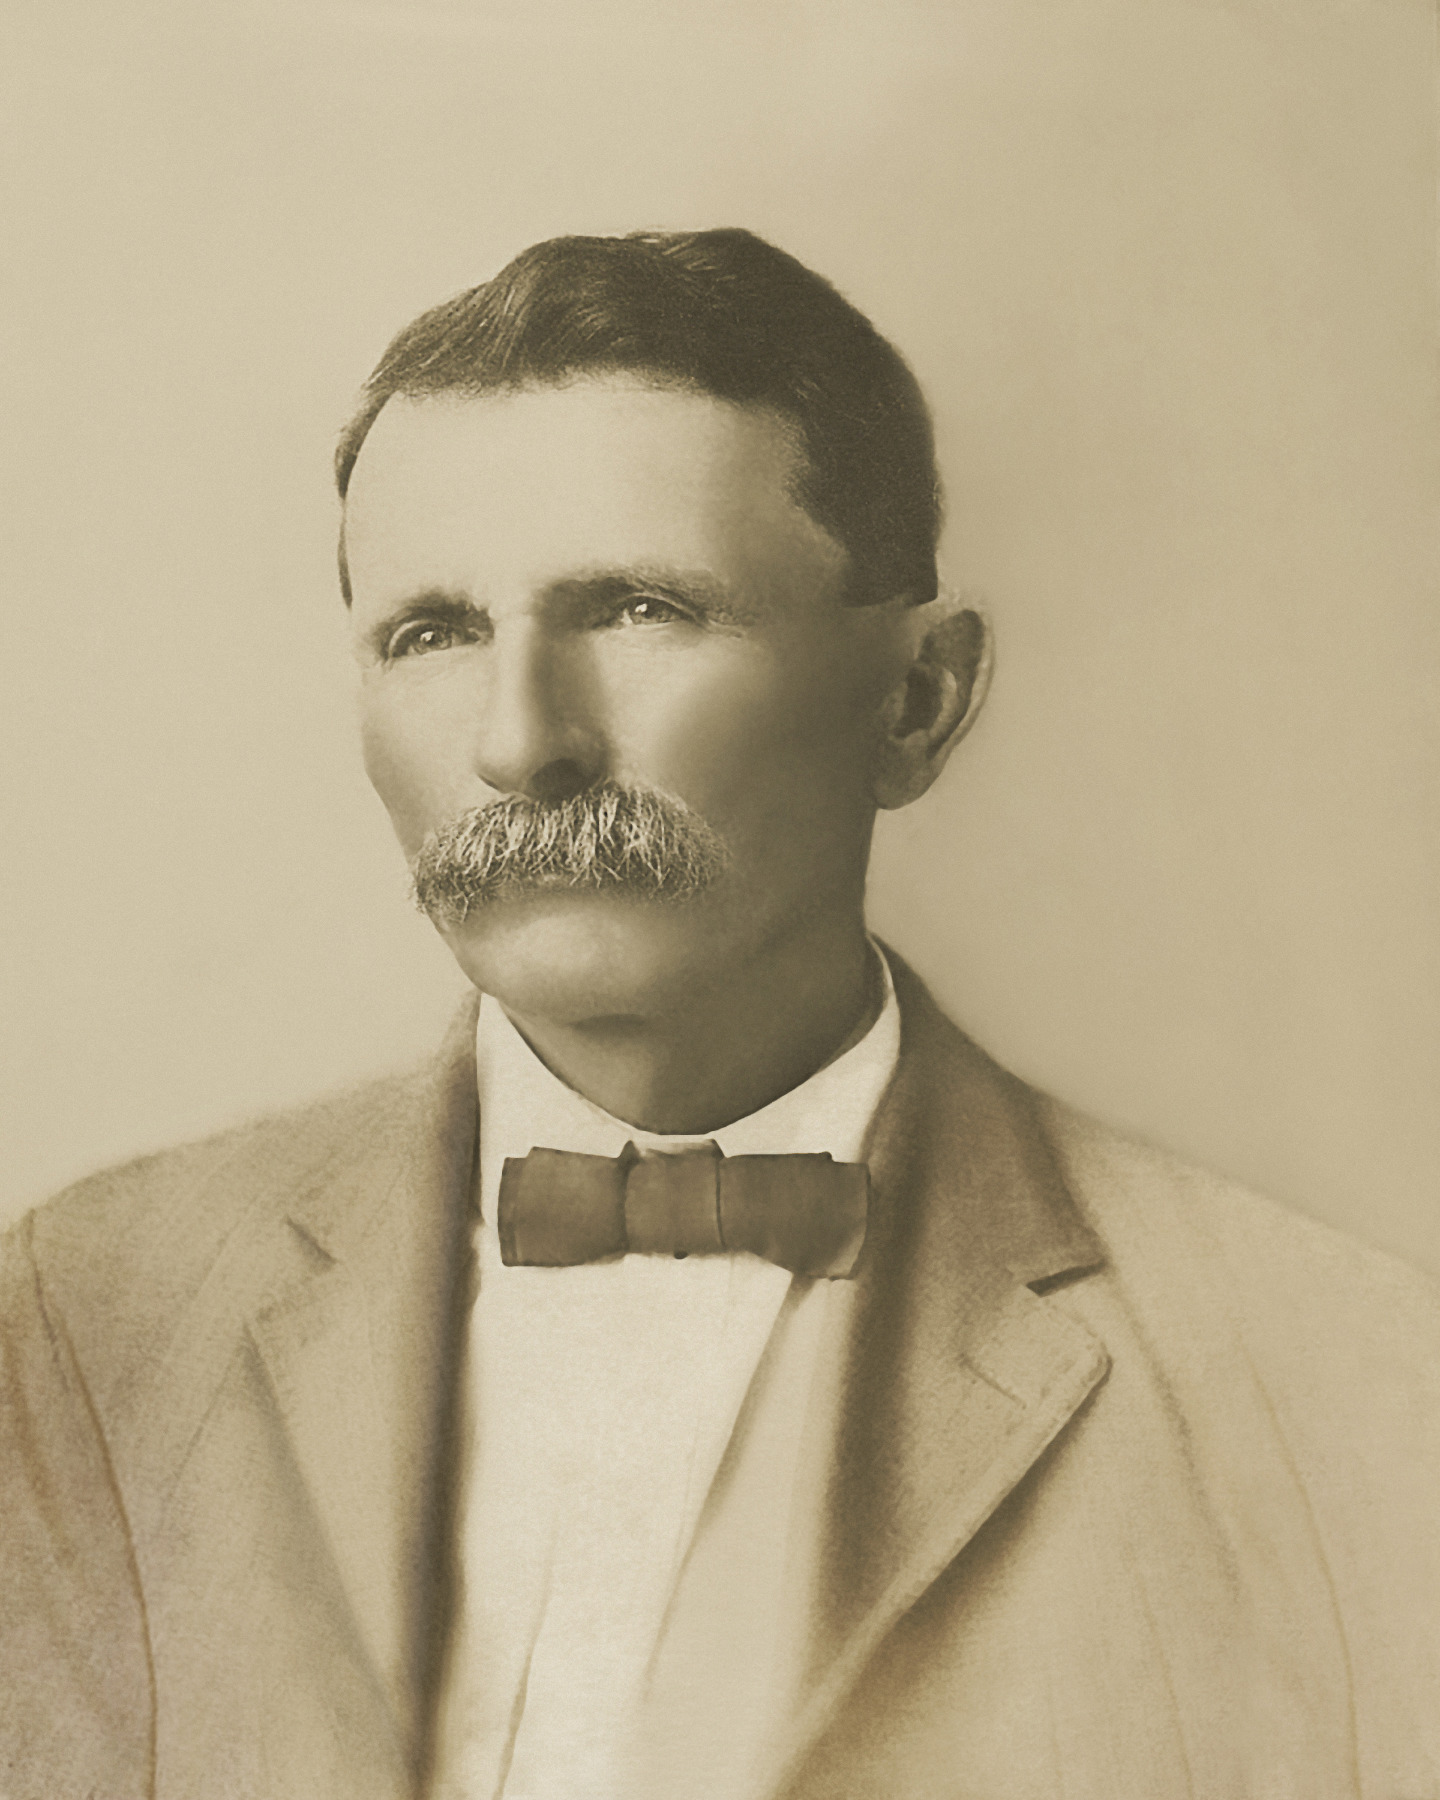 City Marshal Peter Monroe Solomon | Lancaster Police Department, Texas